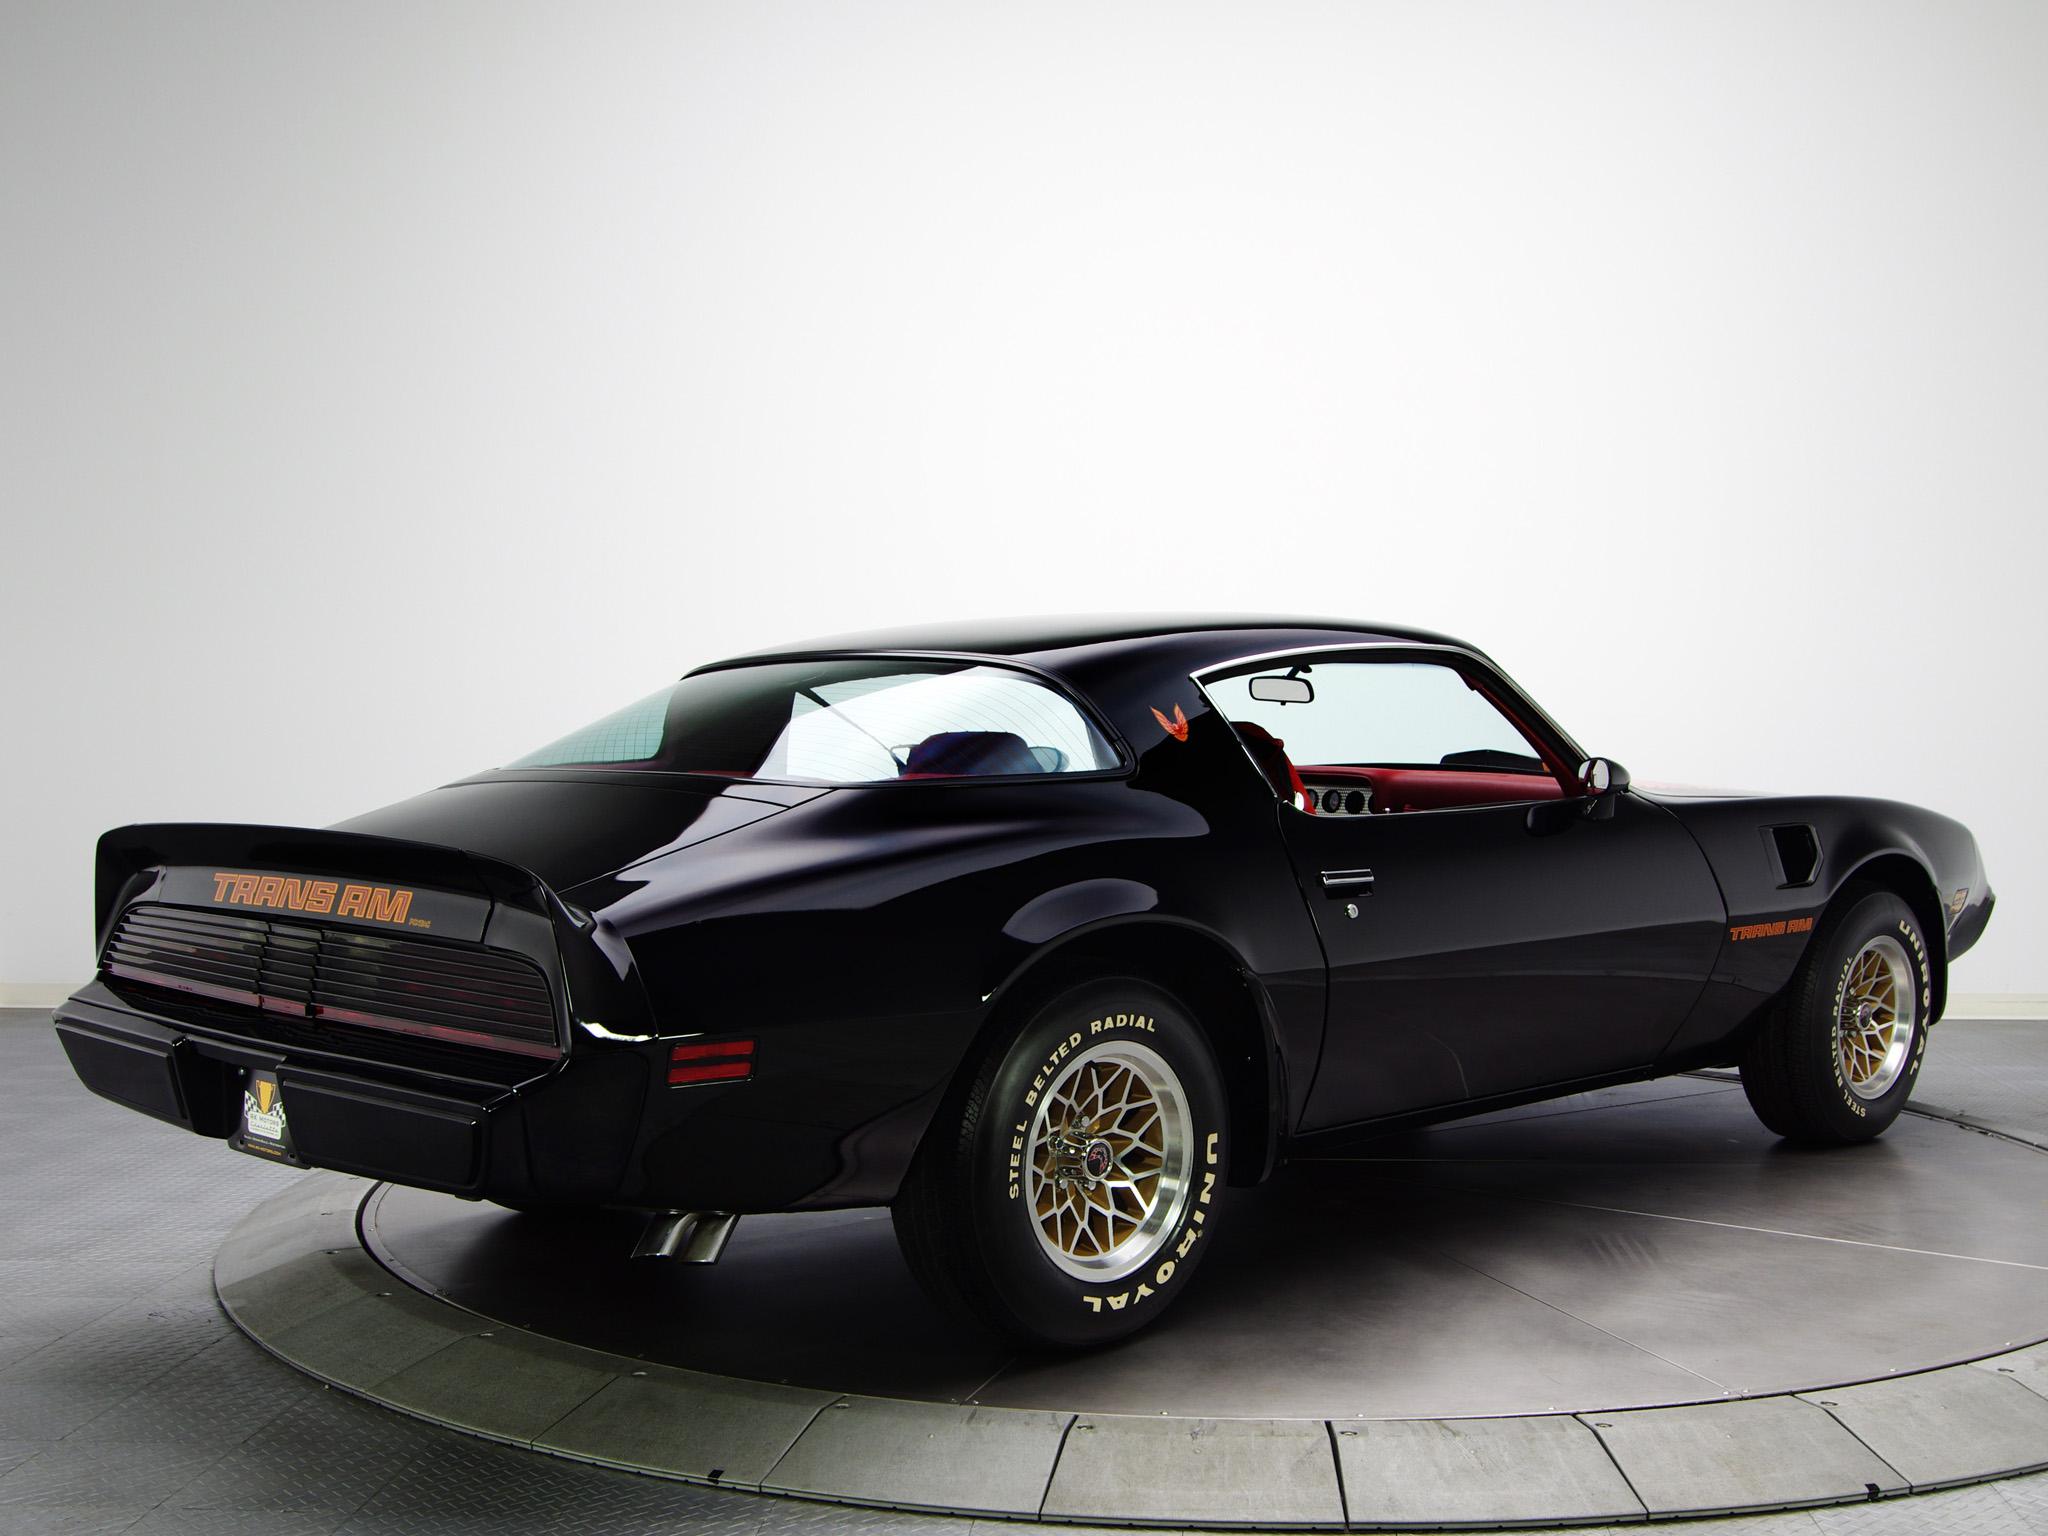 1979 Pontiac Firebird Trans Am 6 6 L80 muscle classic trans wallpaper 2048x1536